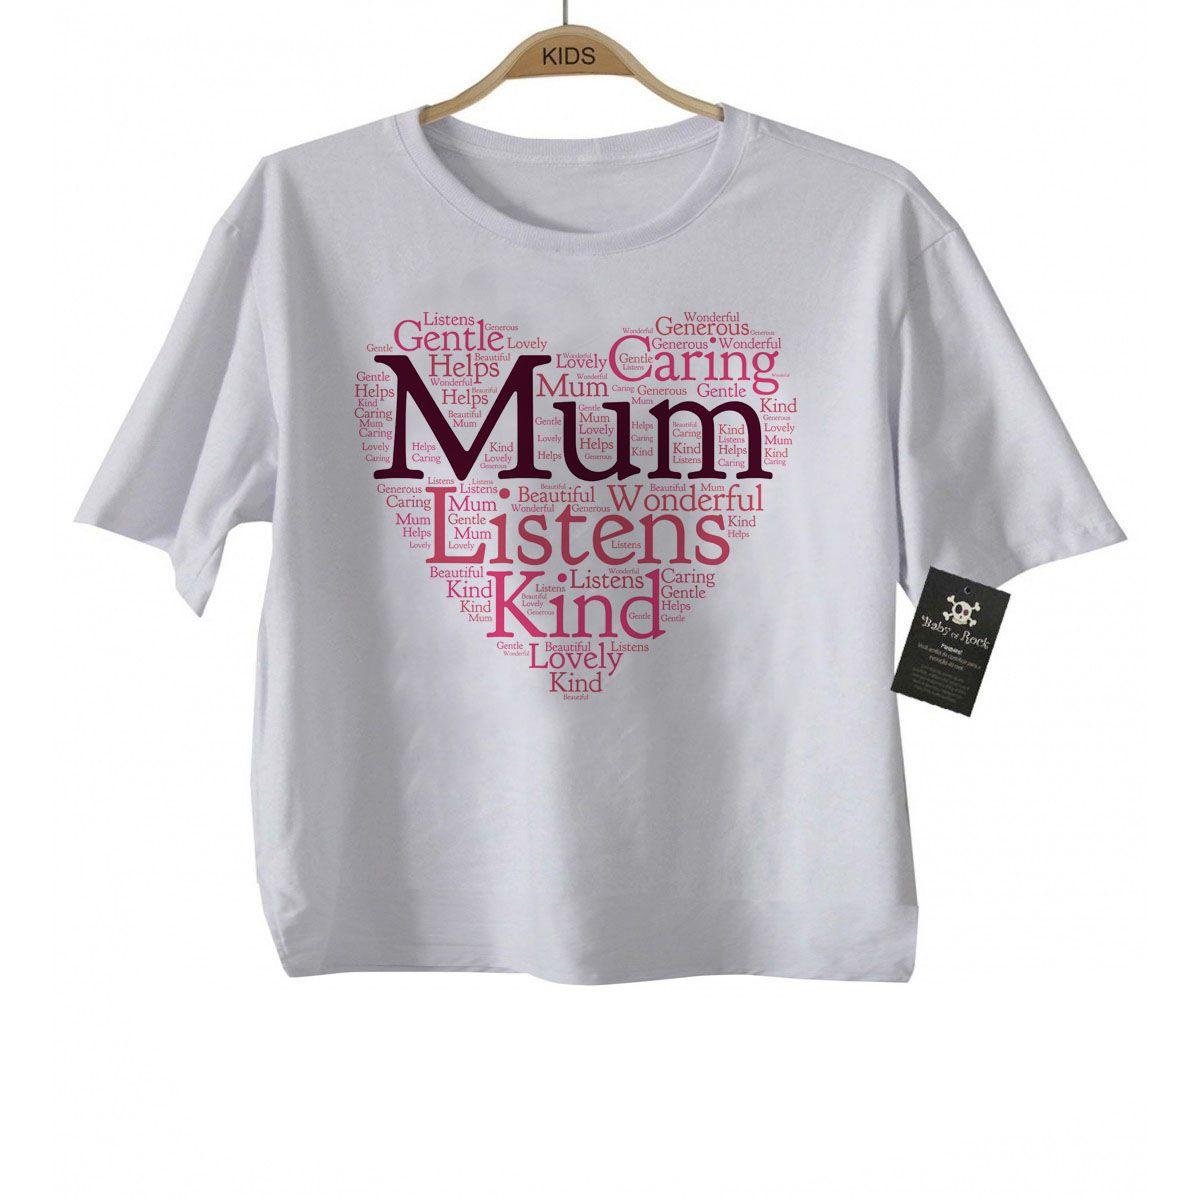 Camiseta Infantil  para Mamães Mum Heart - White  - Baby Monster S/A